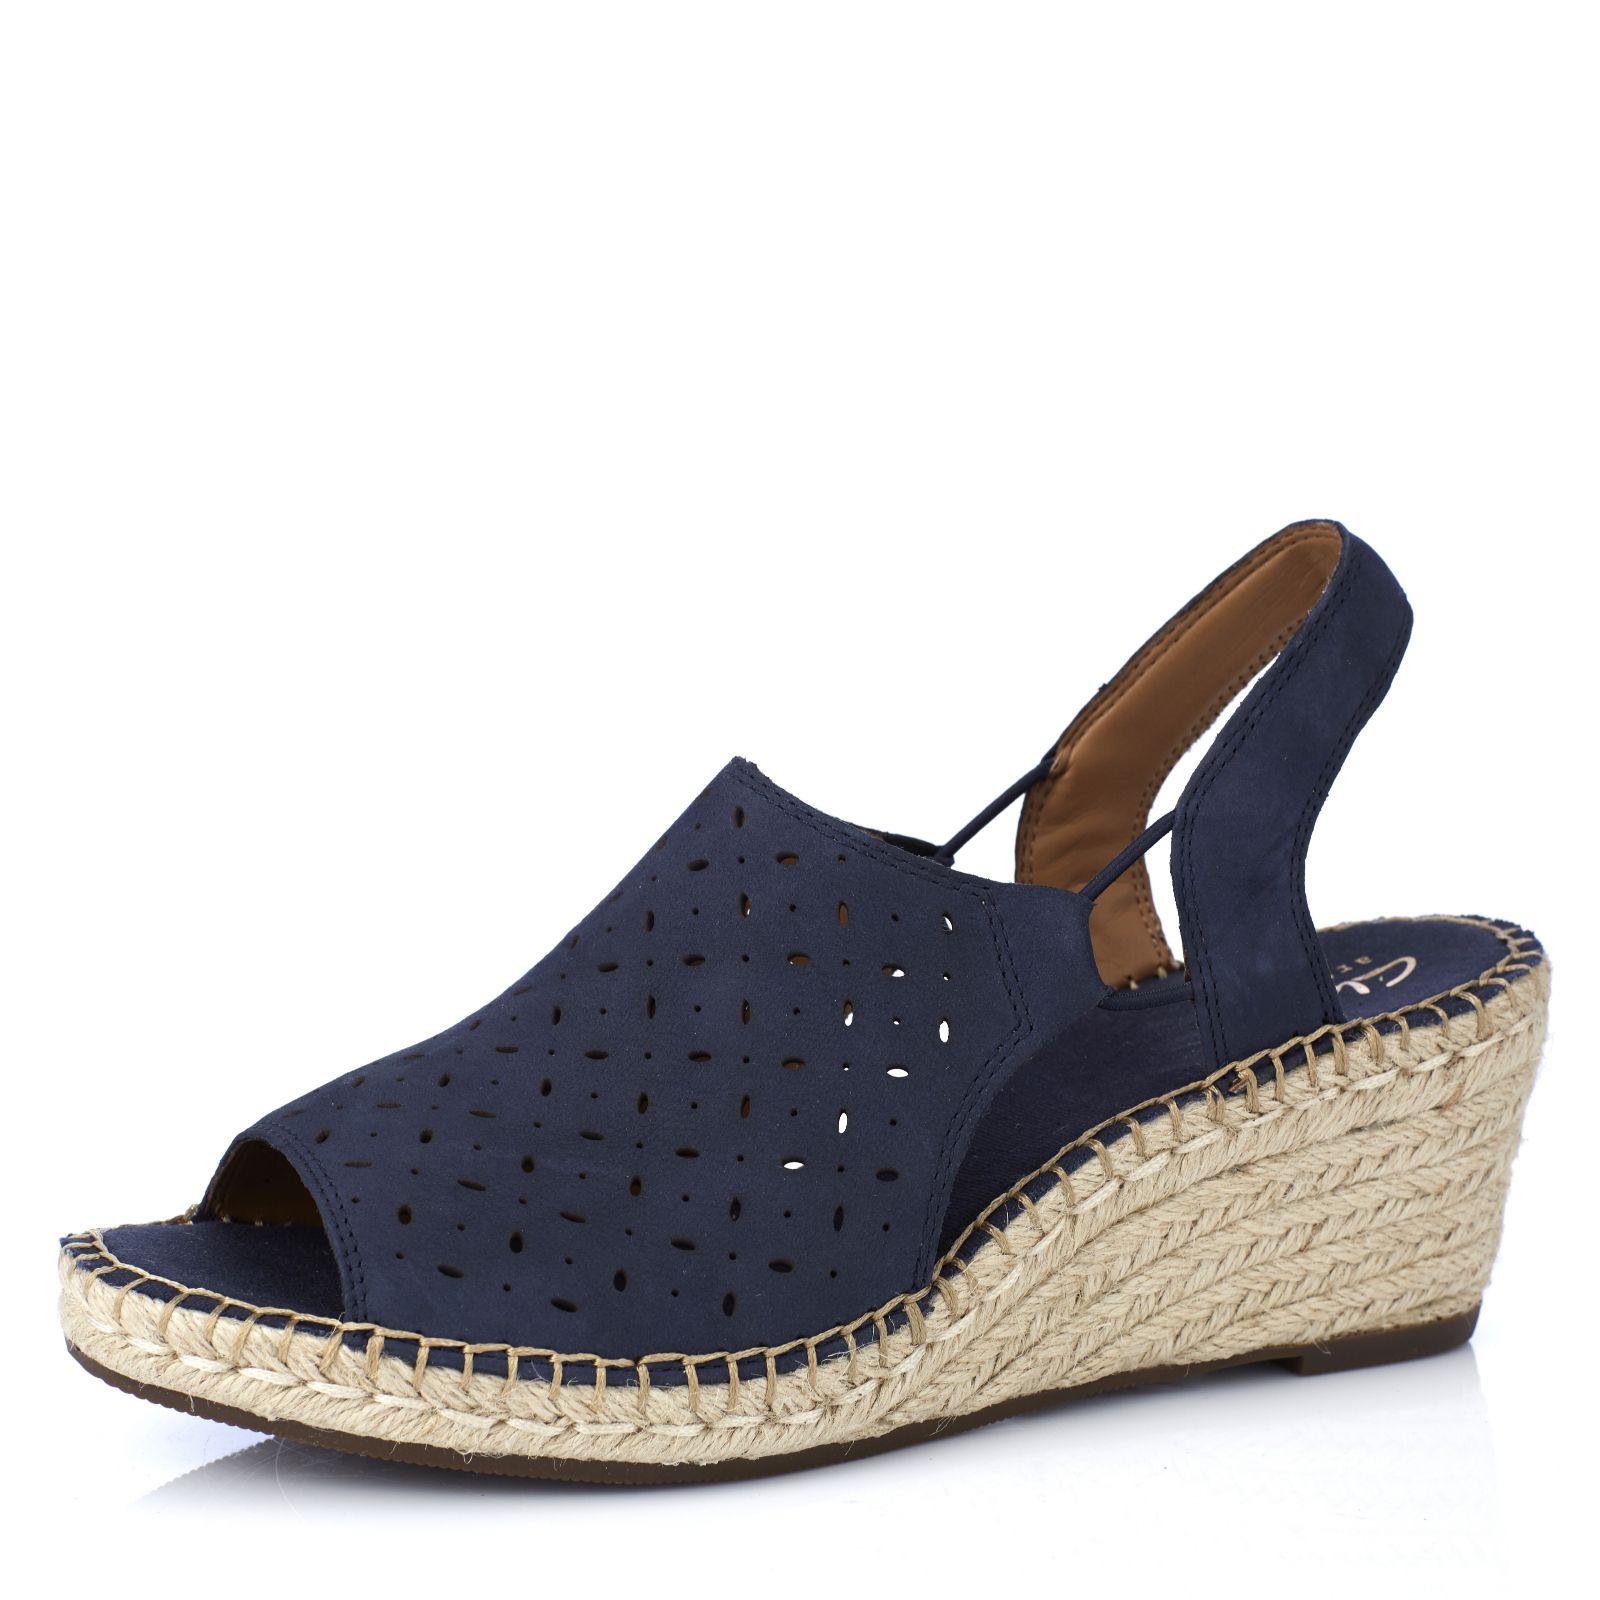 42982e6bd94e Clarks Artisan Petrina Gail Leather Espadrille Wedge Sandal Wide Fit - QVC  UK